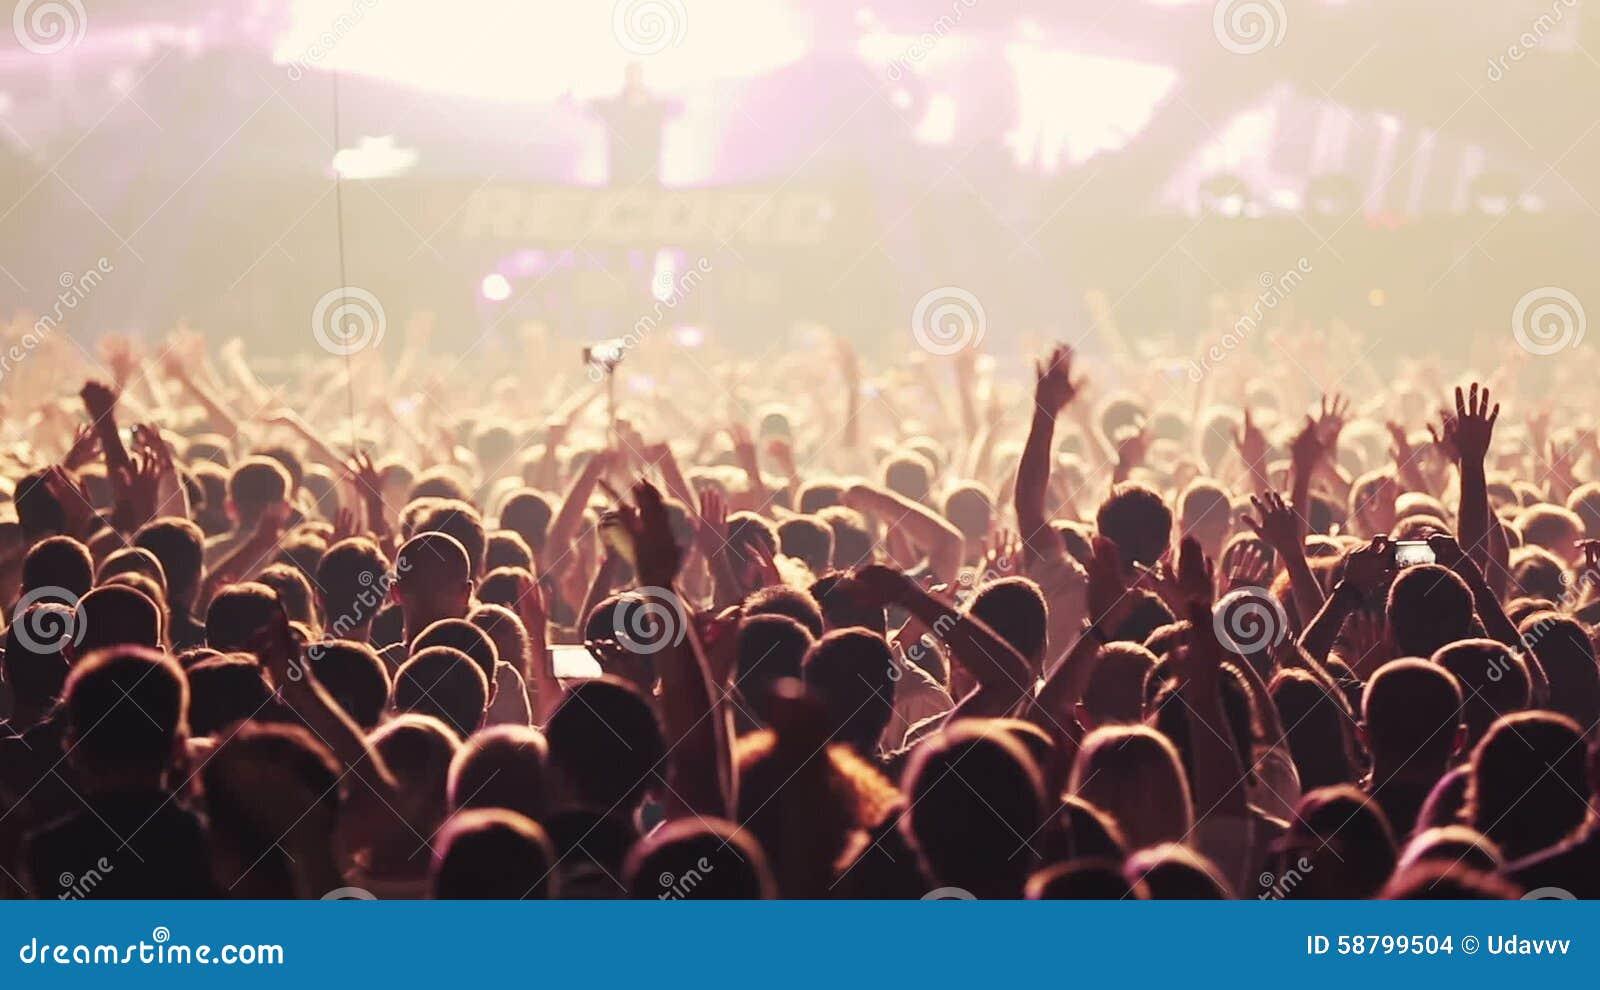 how to use crowd dj